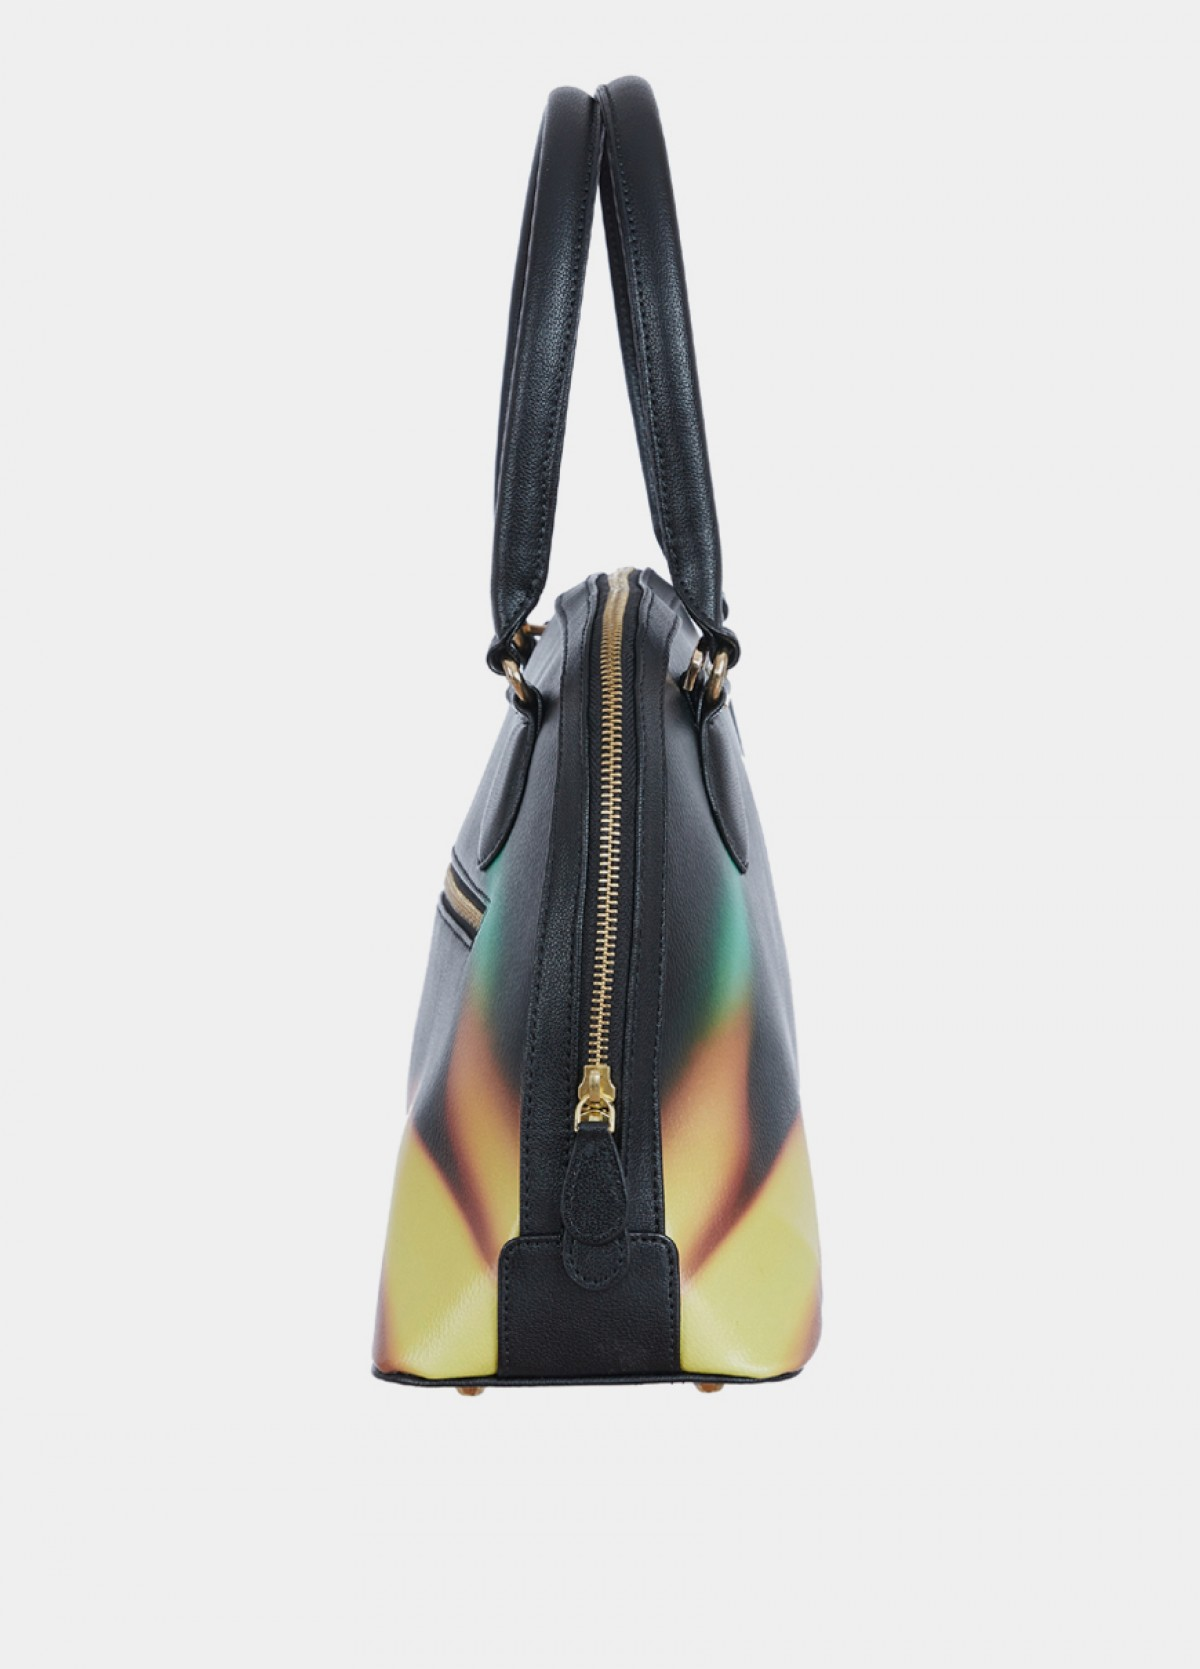 The Magical Lights D Shape Bag